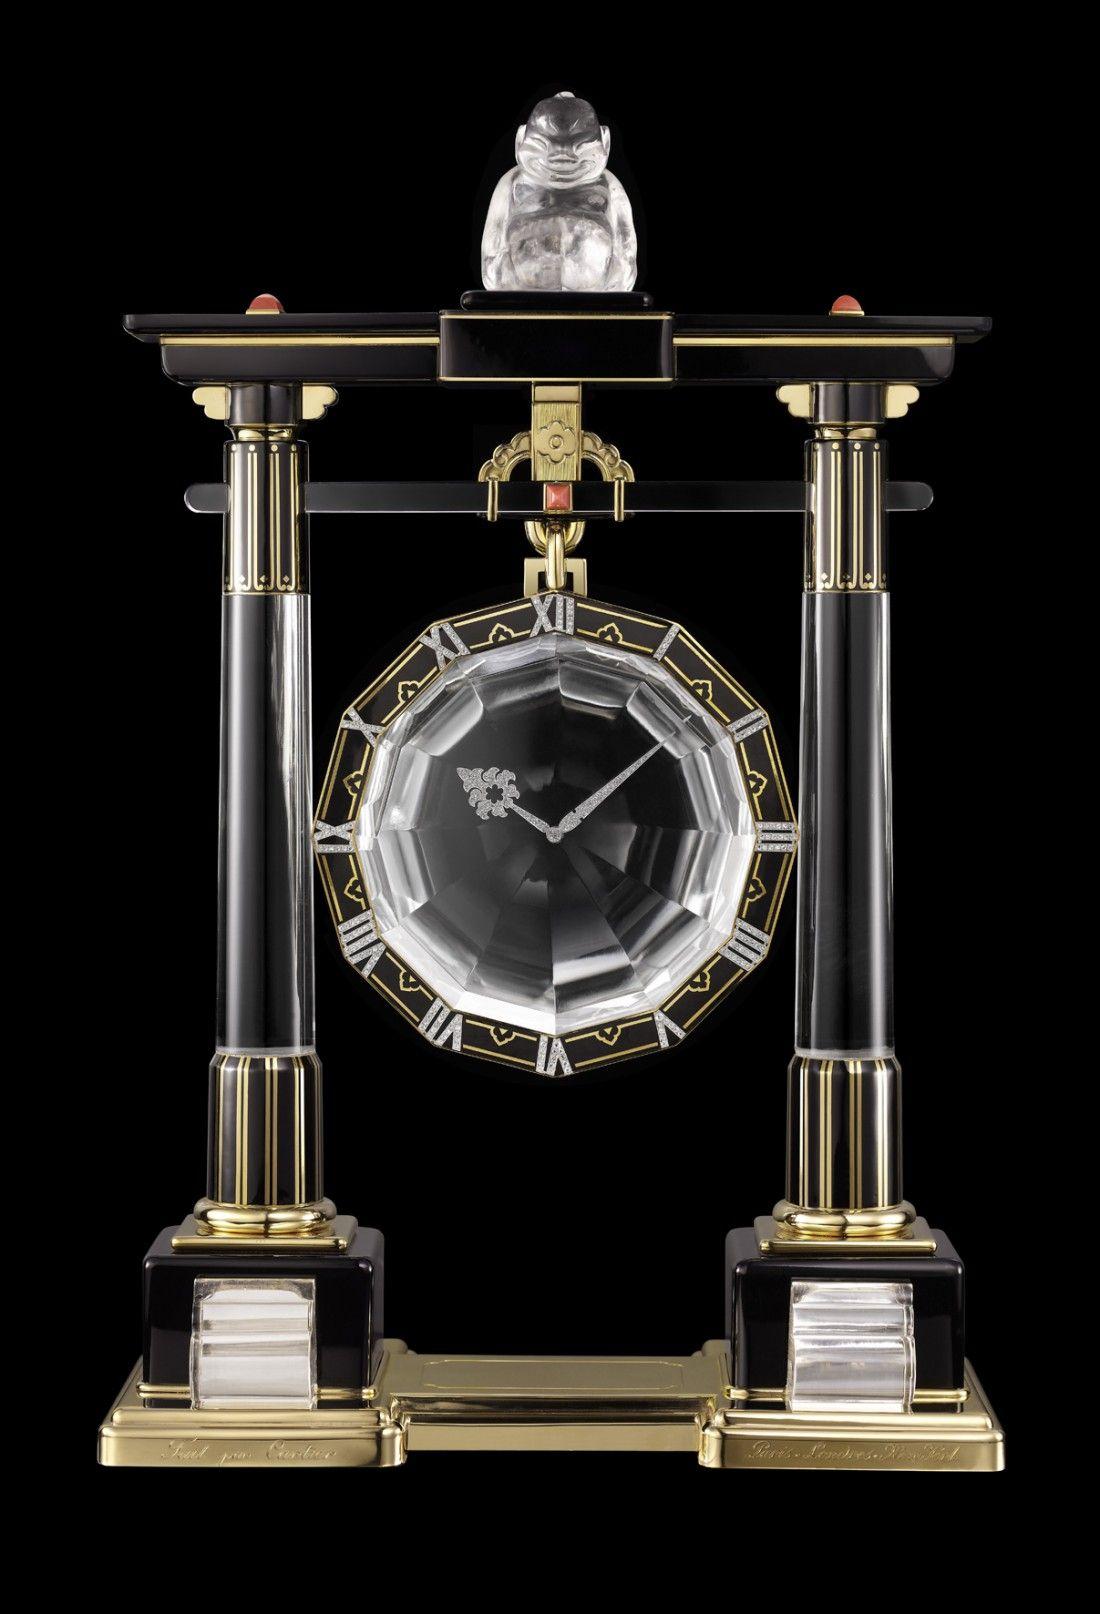 Pendule mystérieuse cartier 1923 mystery clock classic clocks modern clock